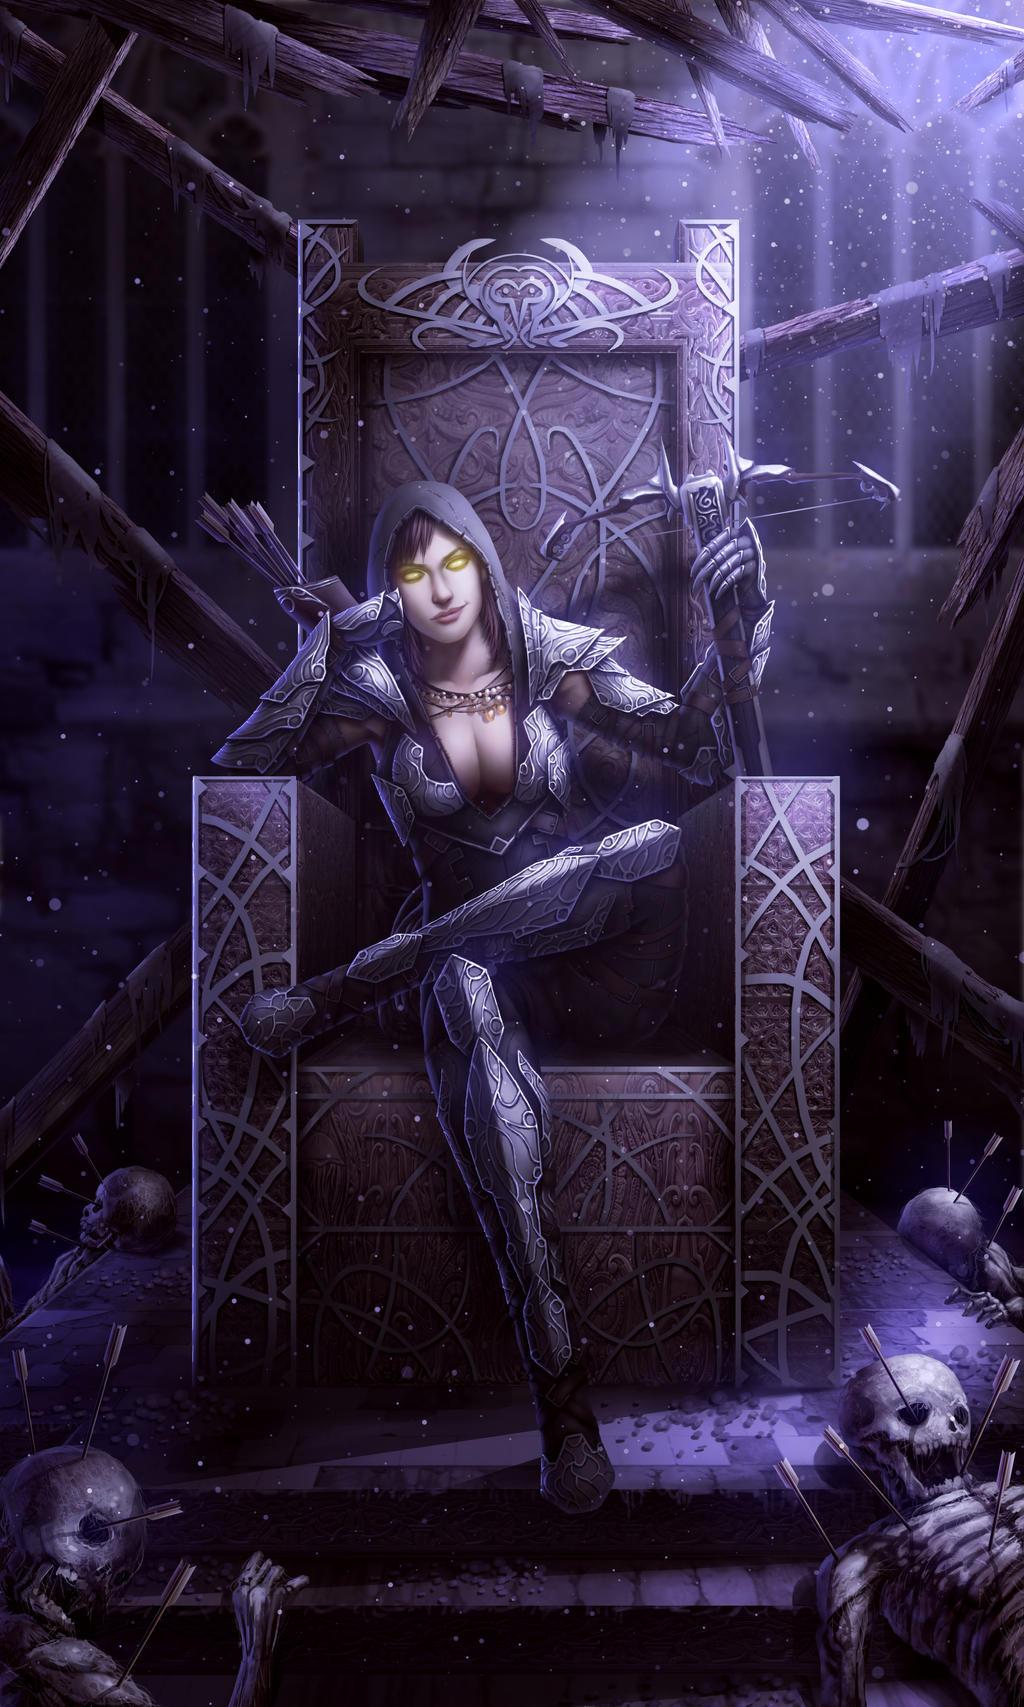 how to buy diablo 3 reaper of souls